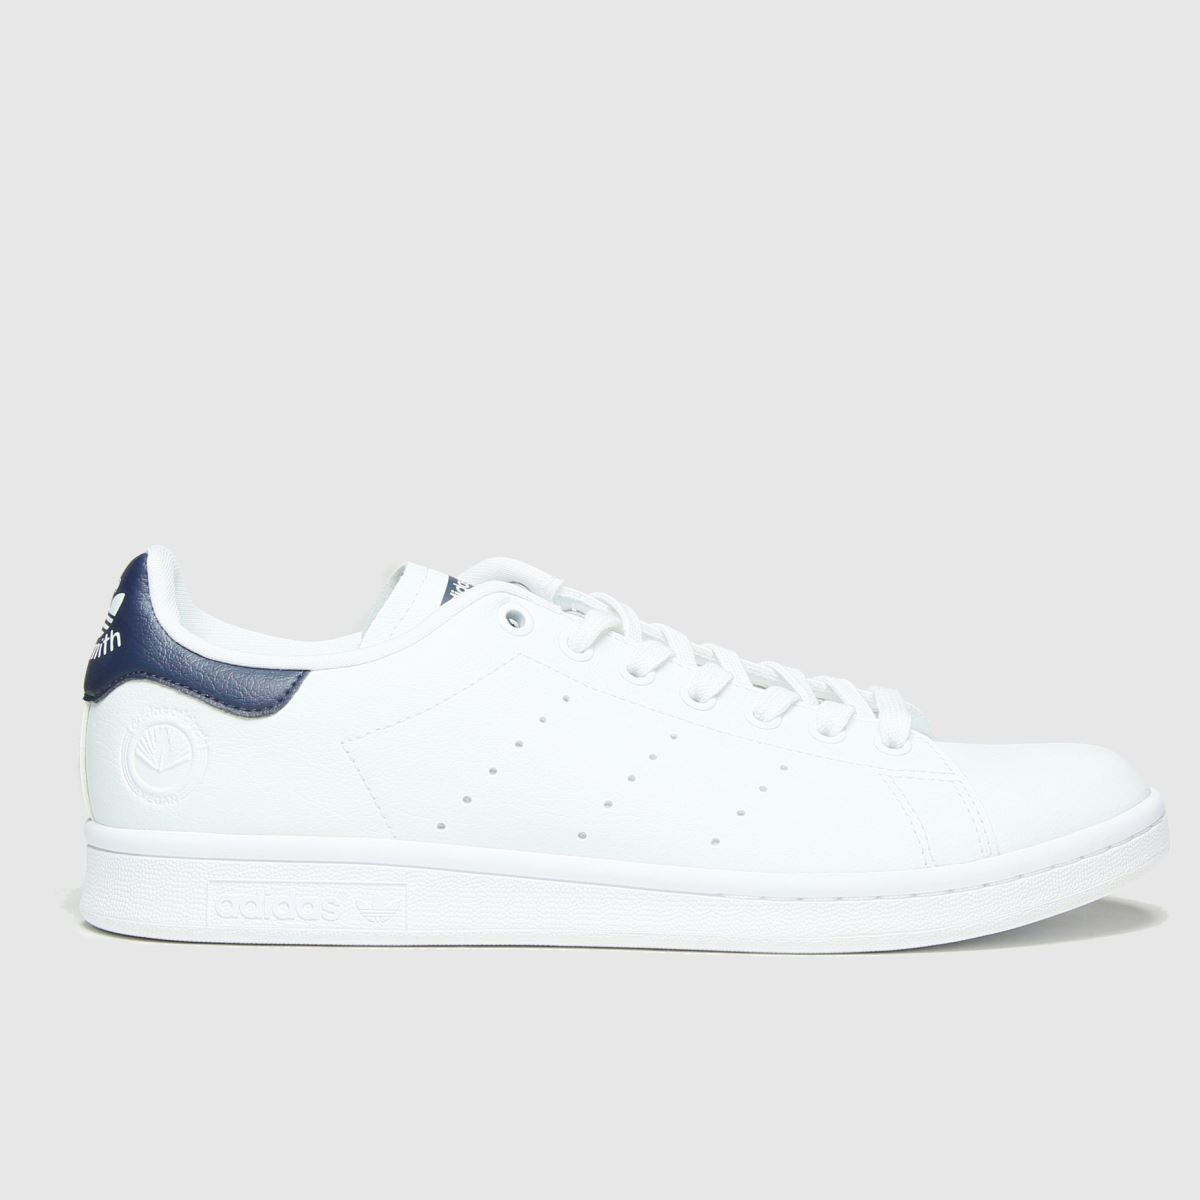 Adidas White & Navy Stan Smith Vegan Trainers